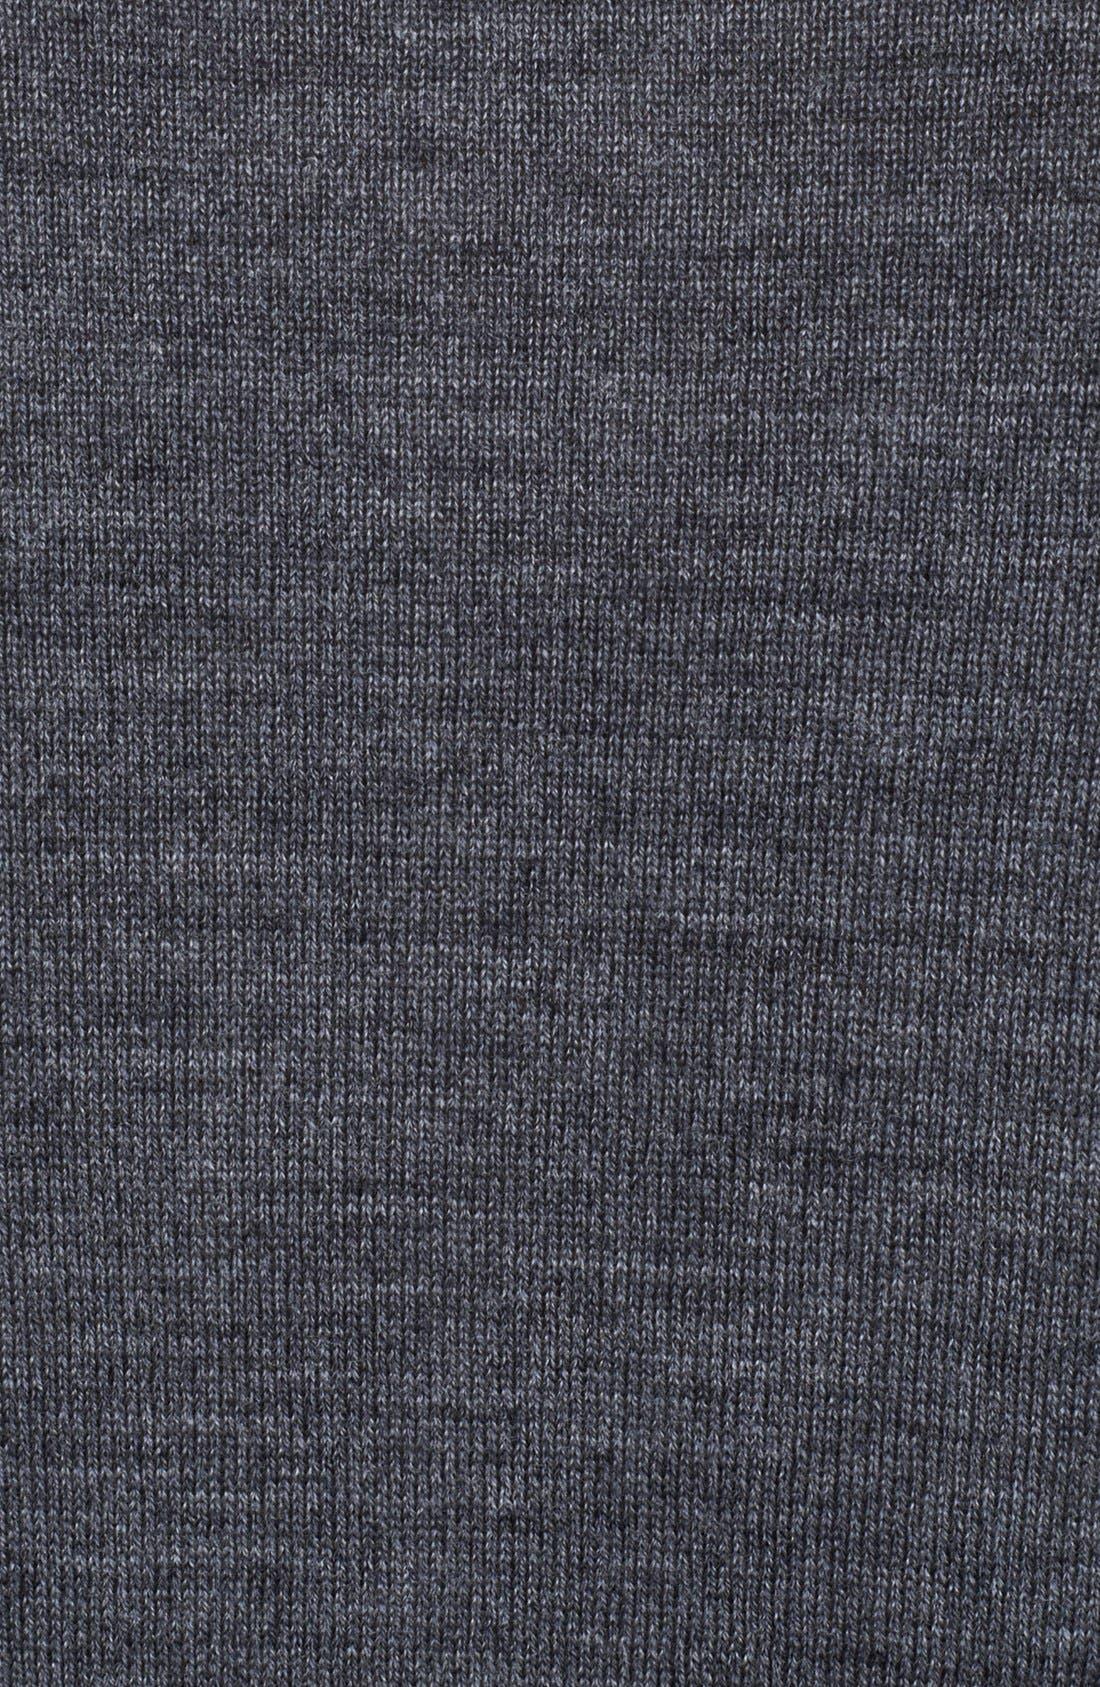 Alternate Image 3  - John Varvatos Collection Merino Wool V-Neck Sweater